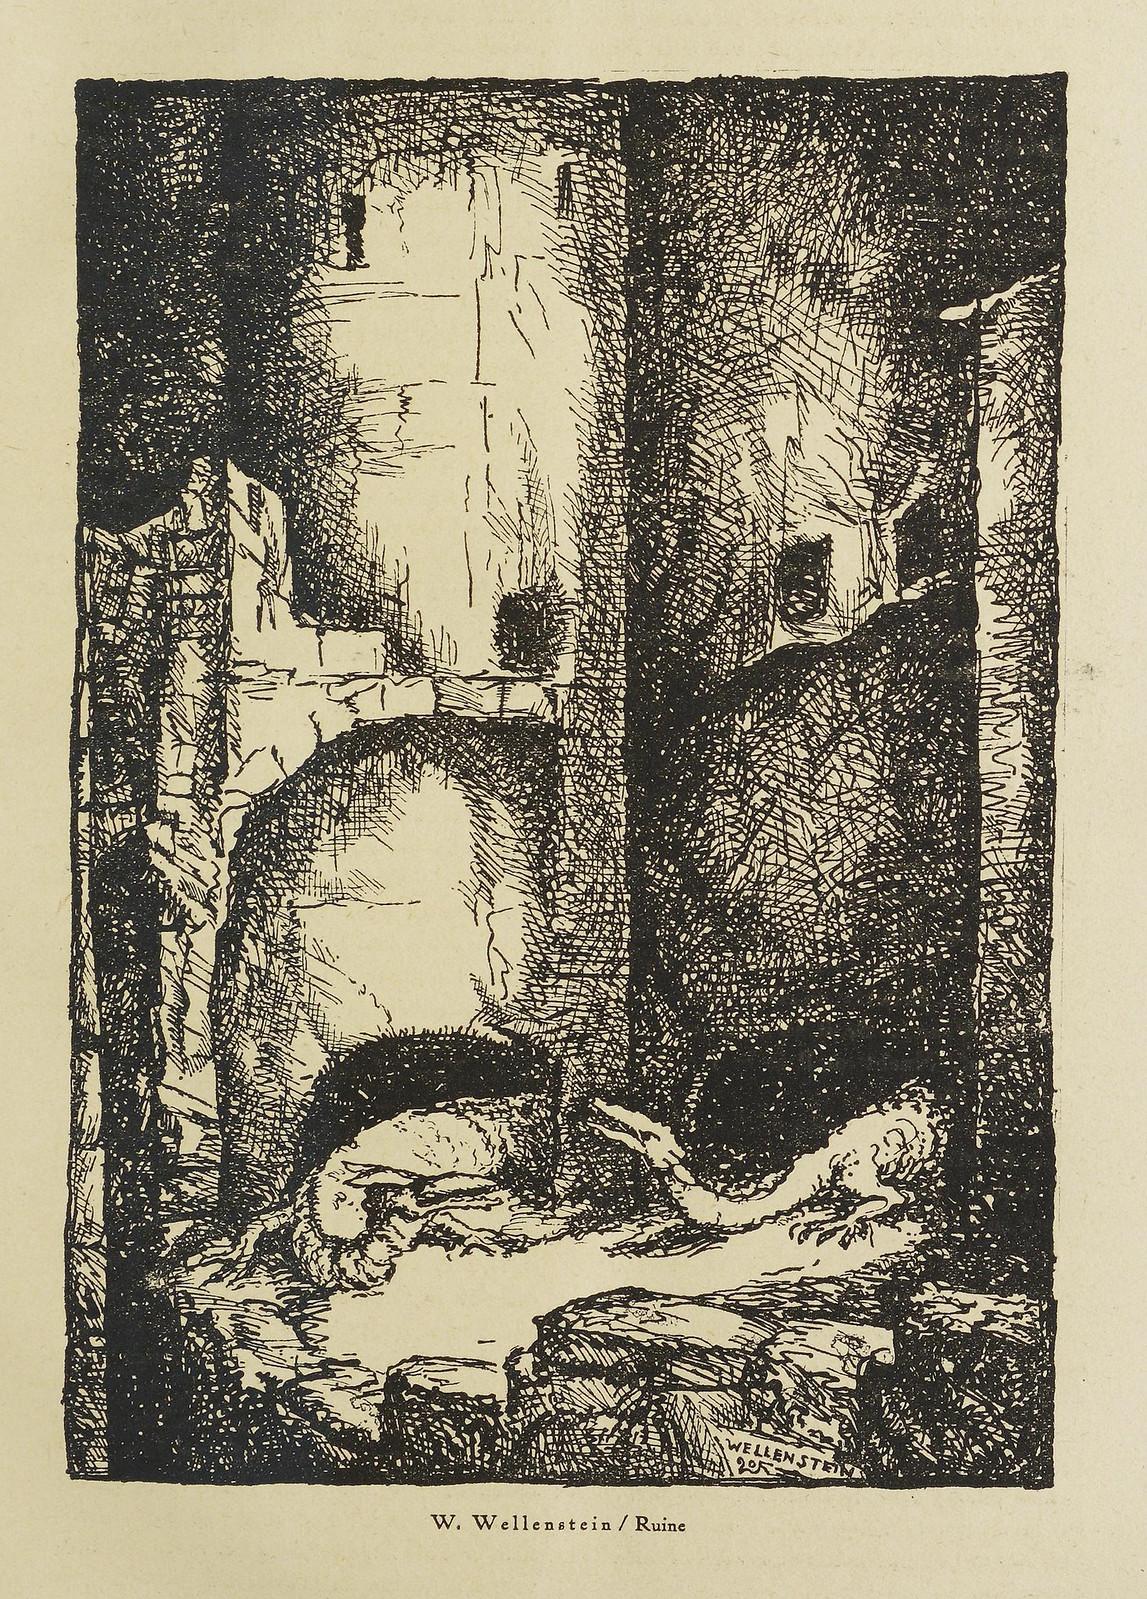 Der Orchideengarten - 1920, W. Wellenstein - Ruin